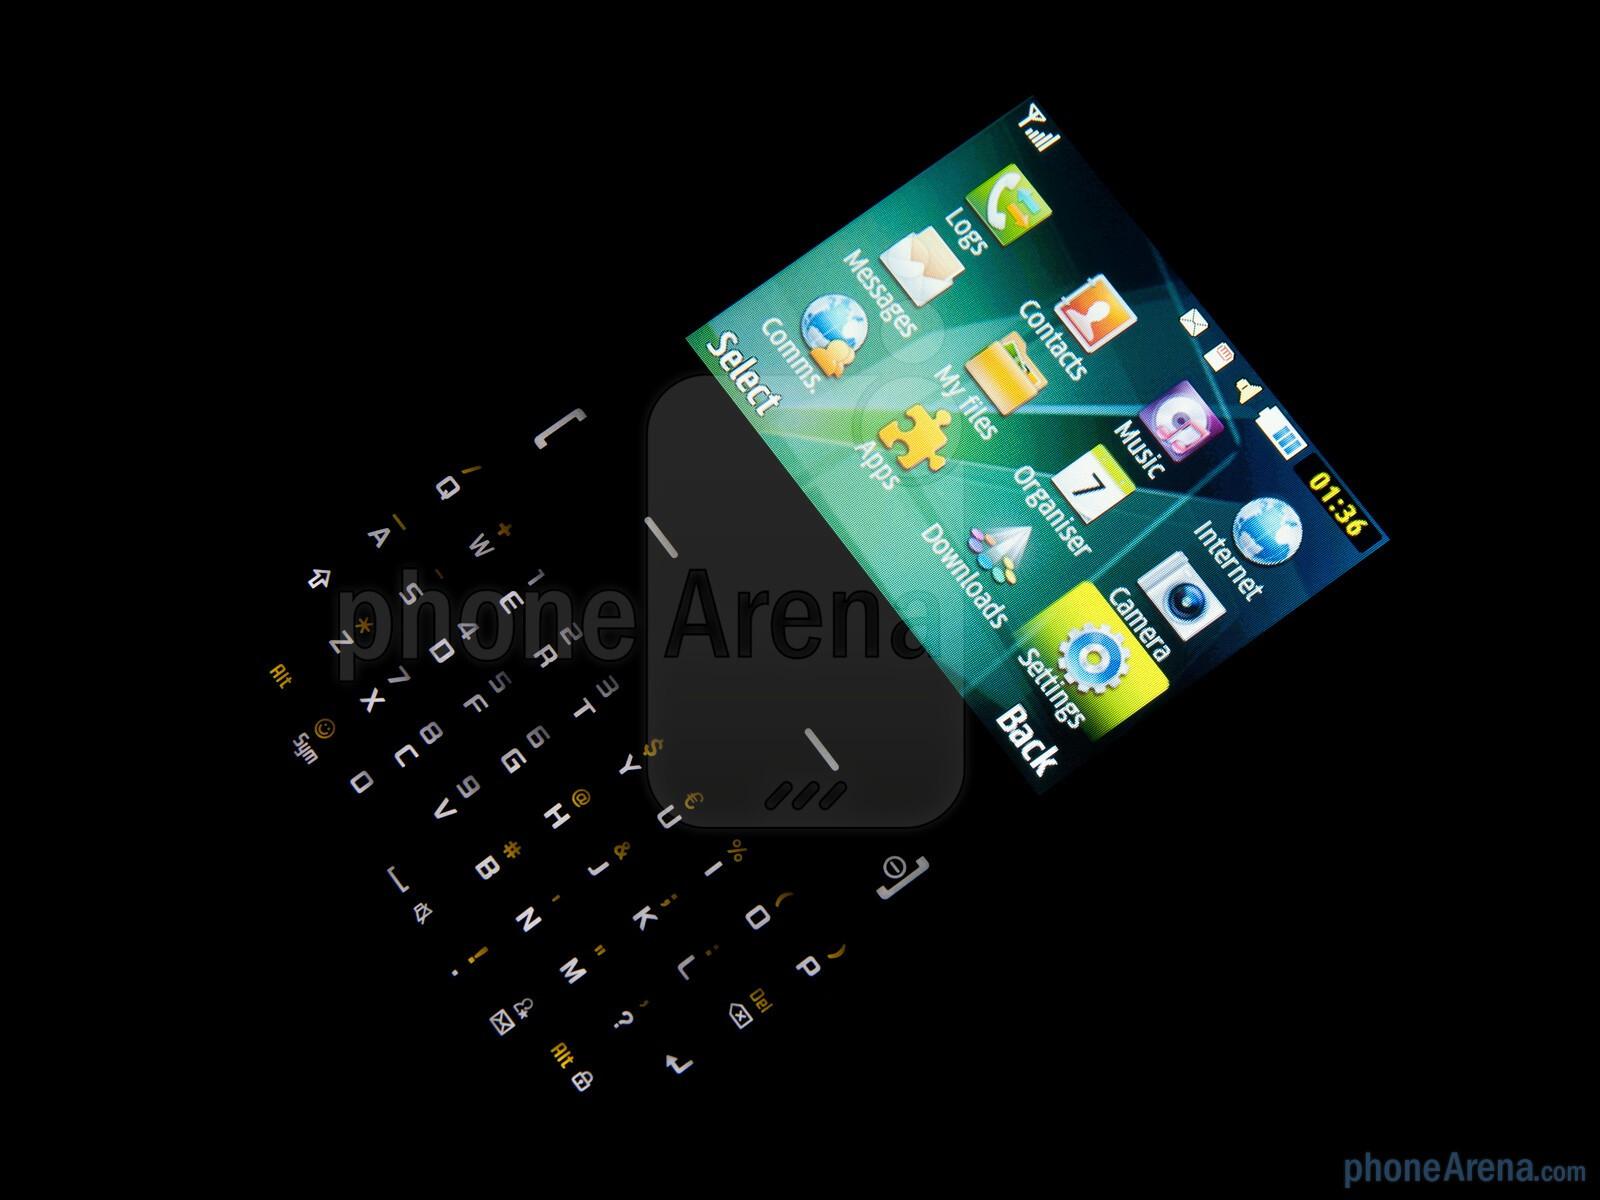 The Samsung Ch t 335 has a pretty BlackBerry esque full QWERTY keyboard